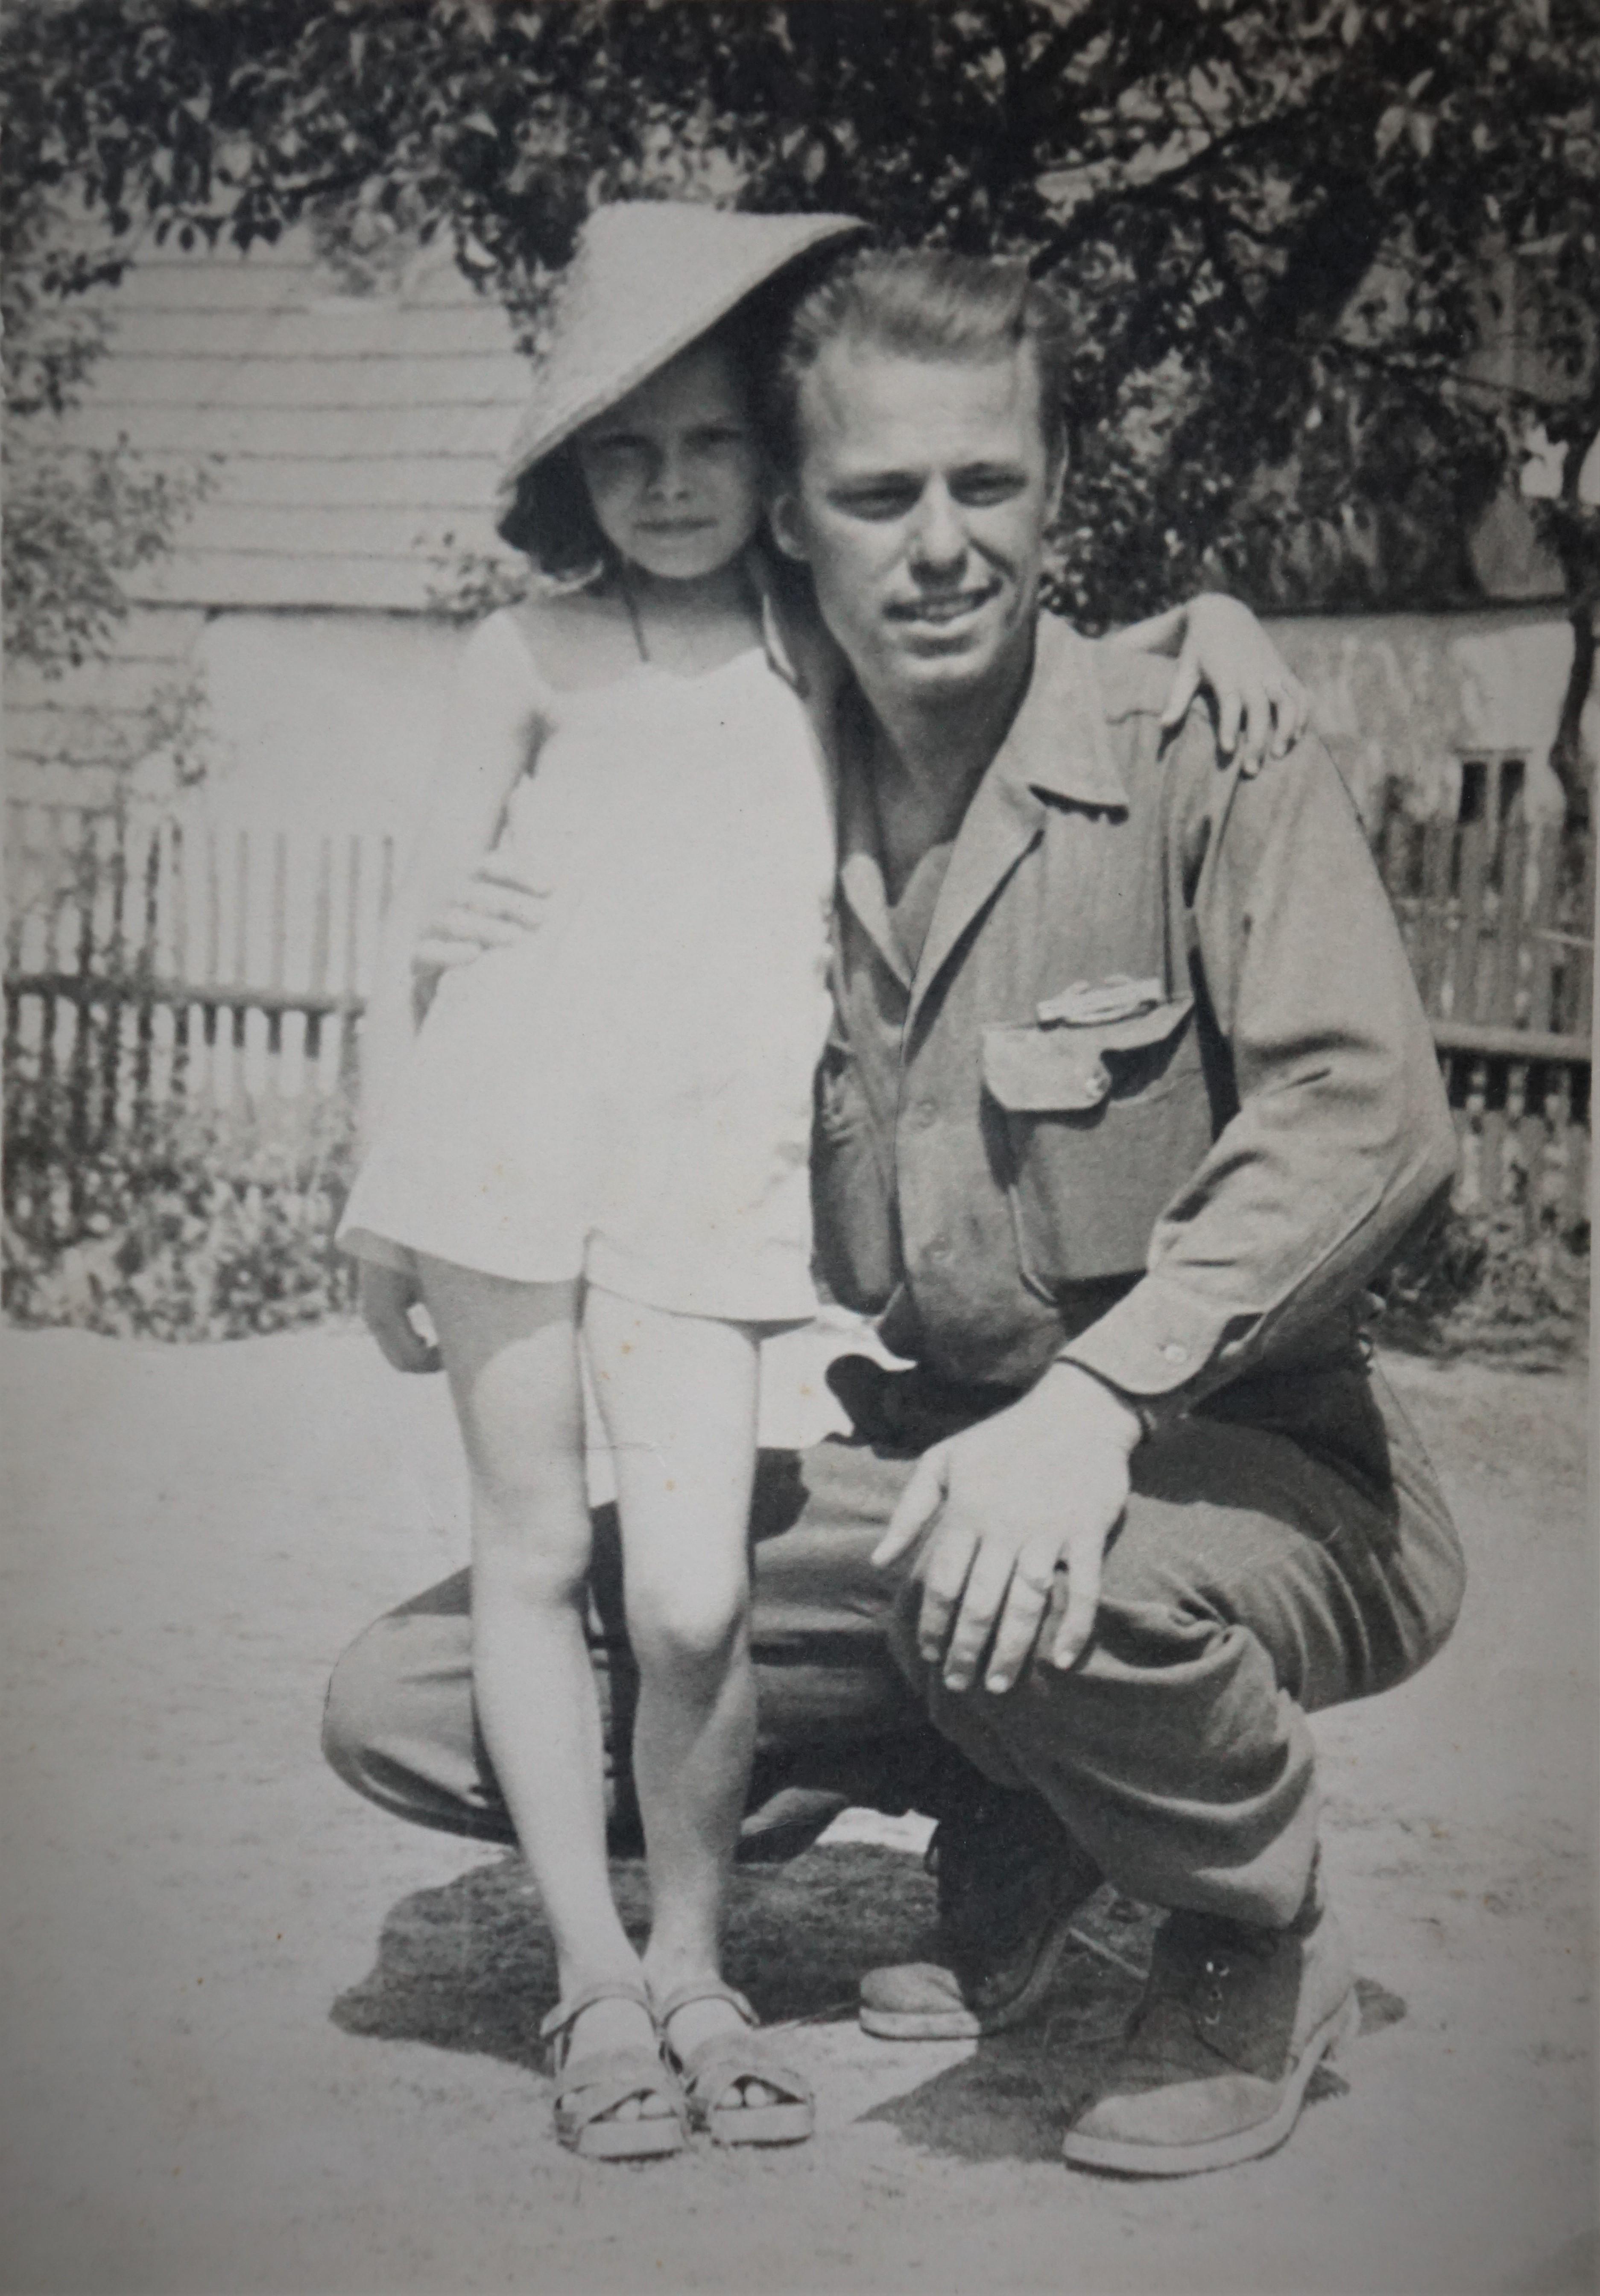 WalterJohnson_Czechoslovakia_May_16_1945 (2)